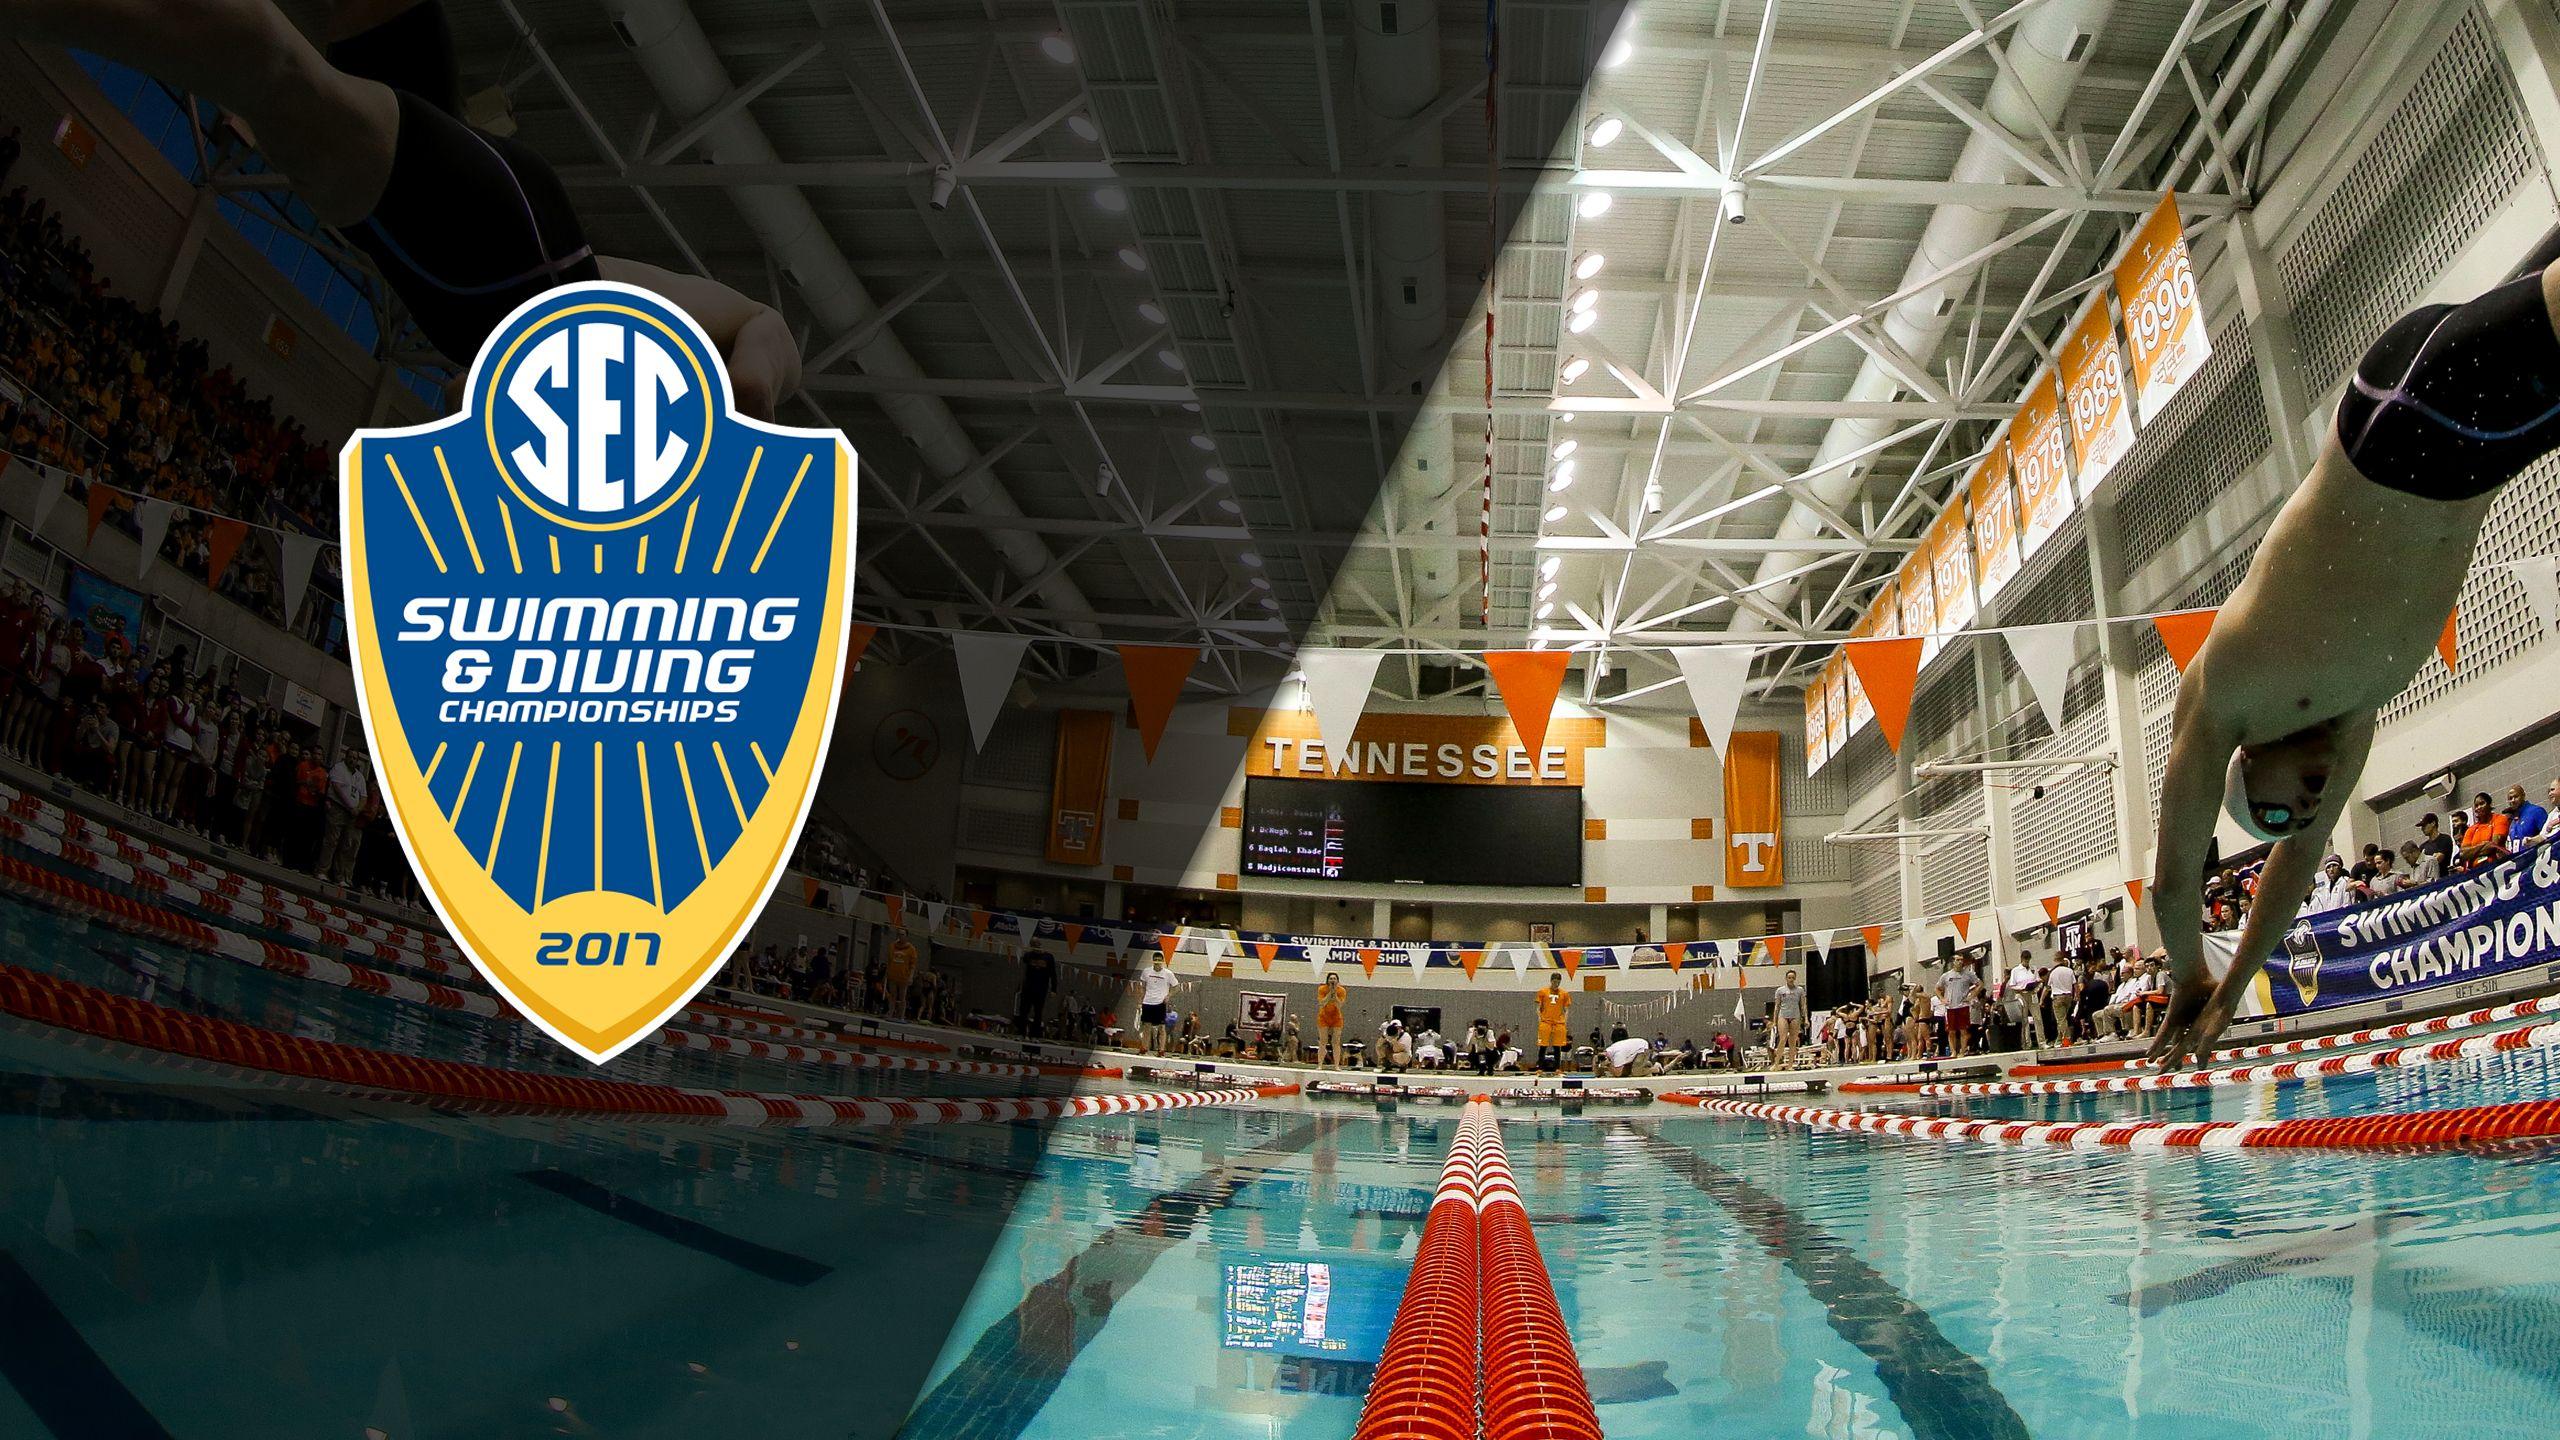 2017 SEC Swimming & Diving Championship